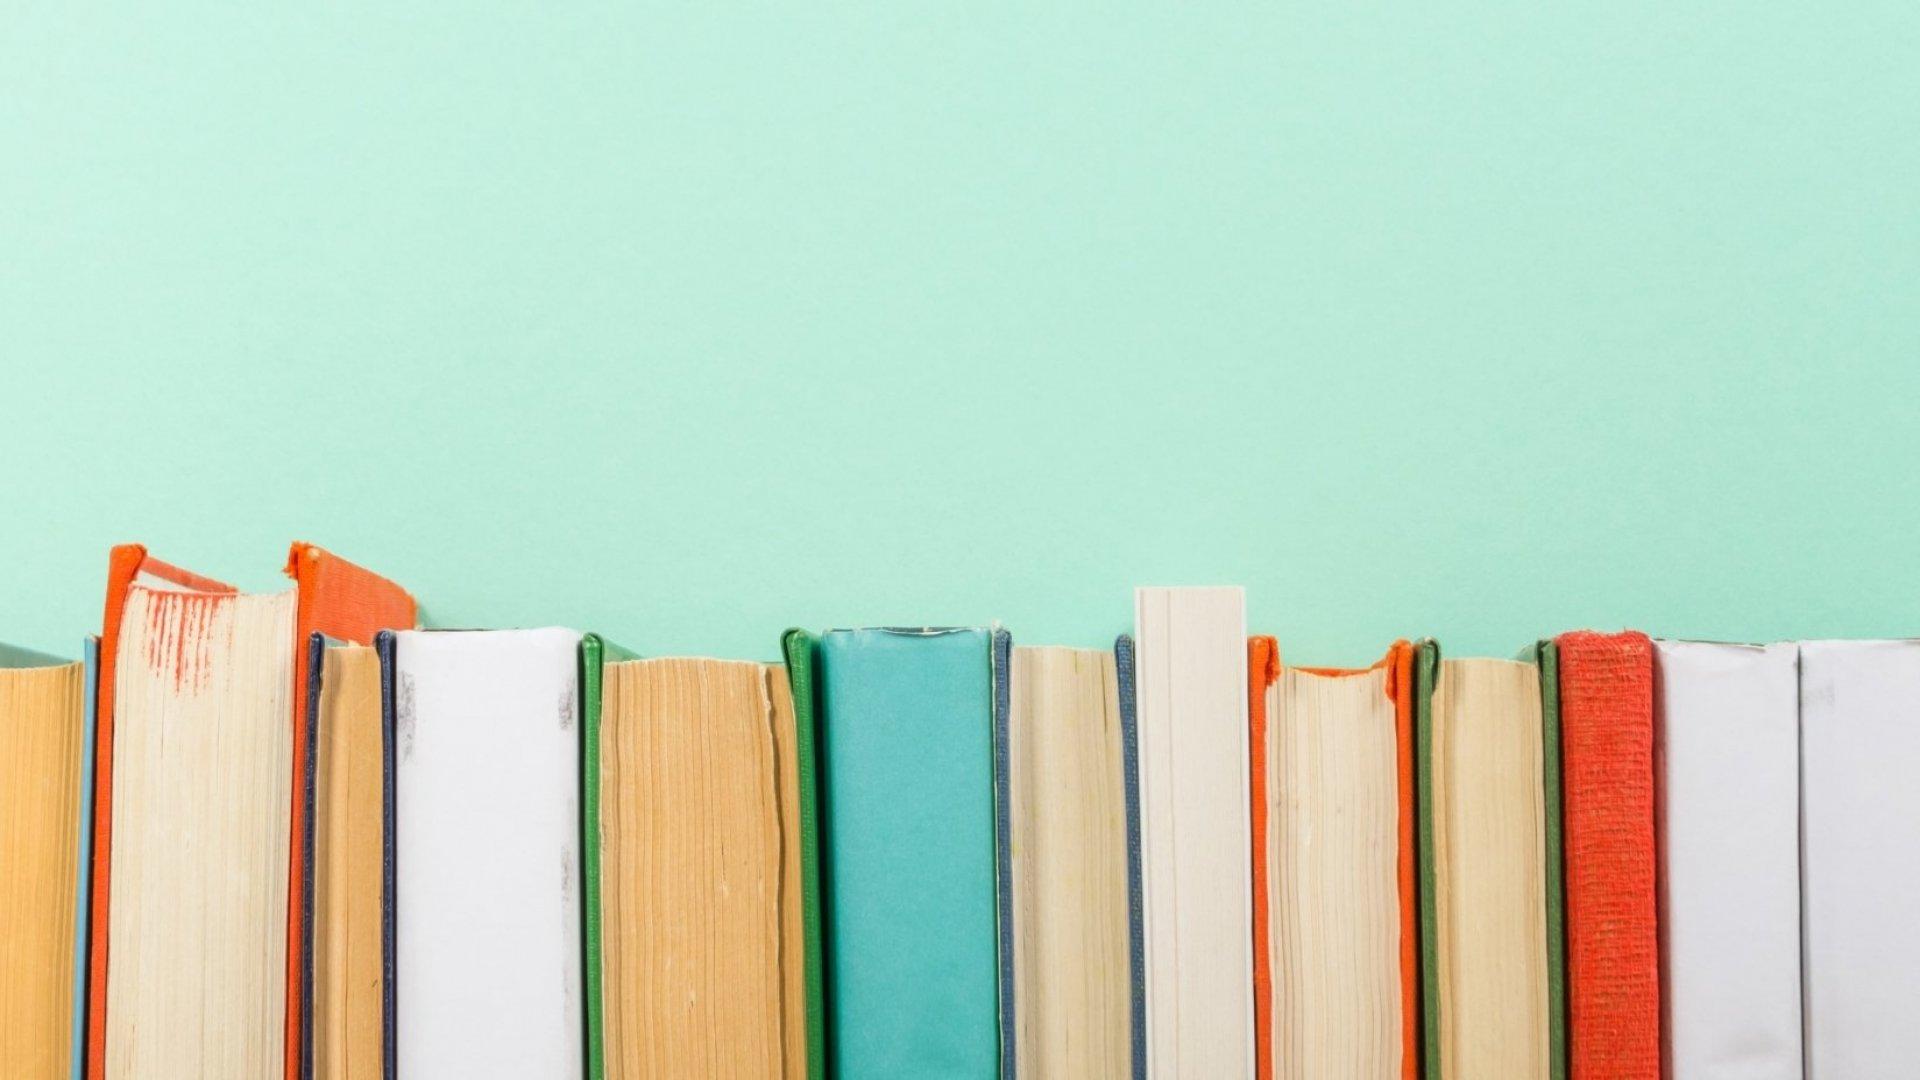 7 Most Popular Motivational Books of 2017